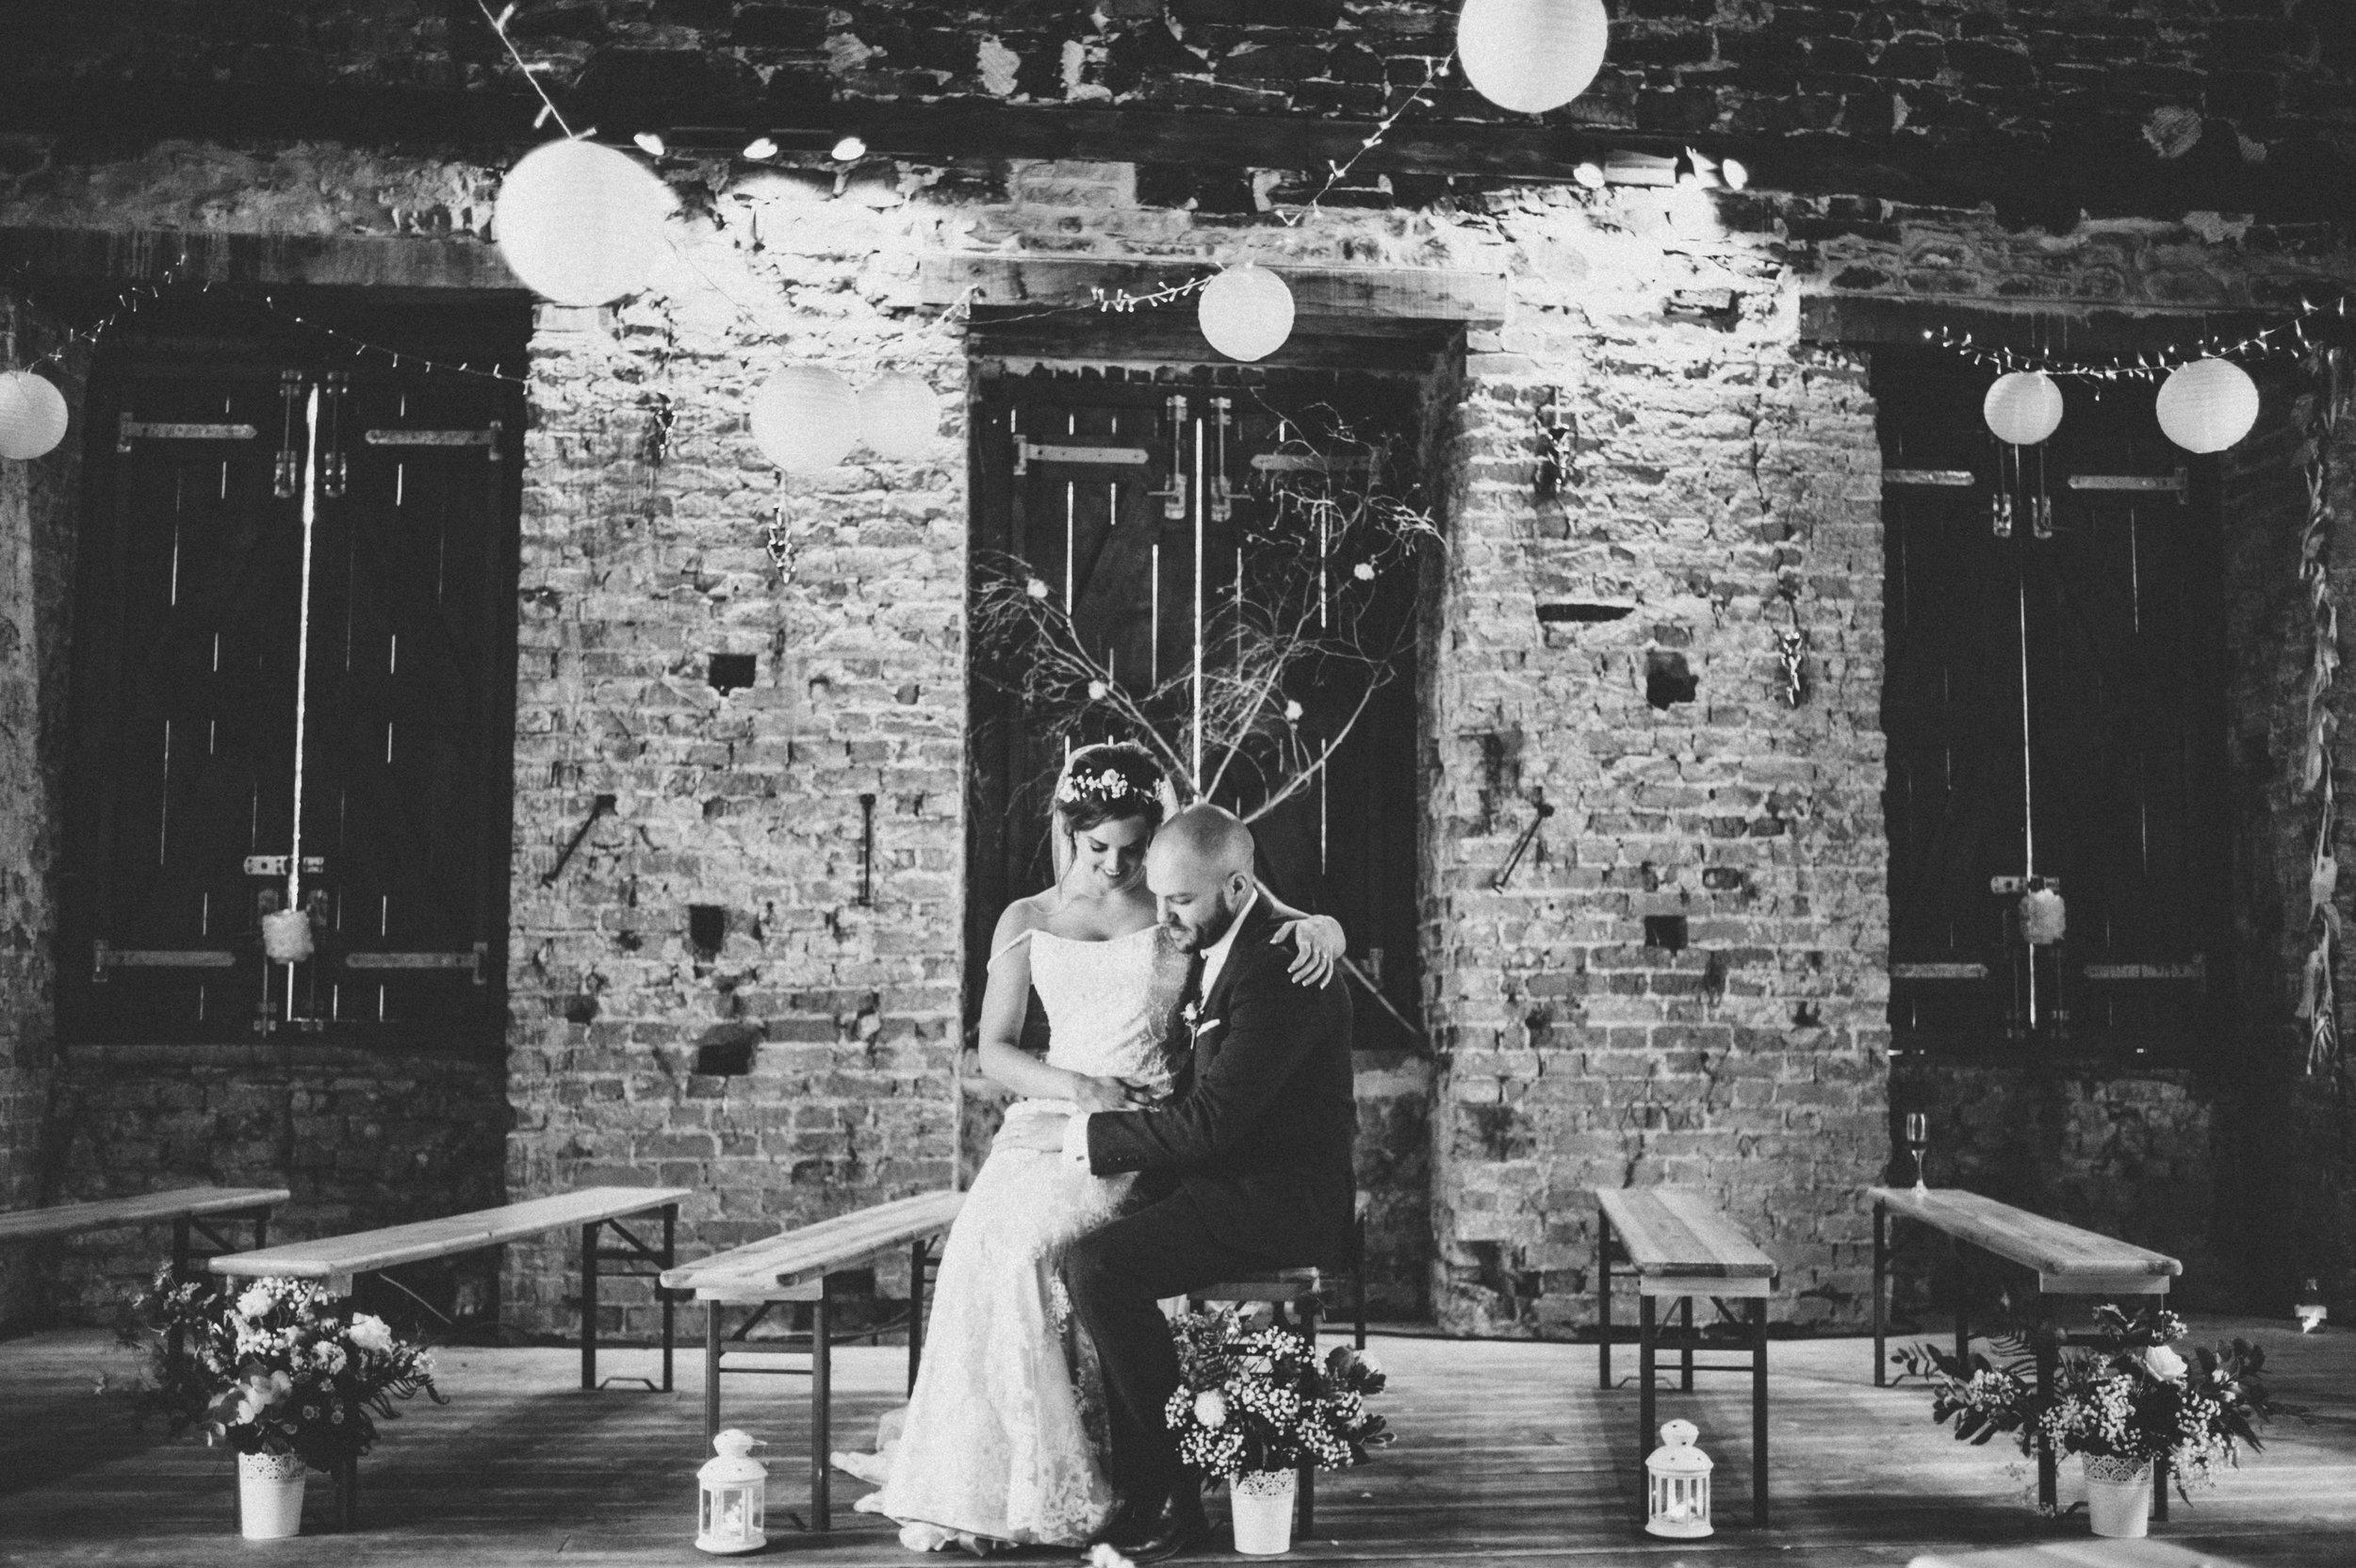 wedding photography north devon harrera images- 15.jpg